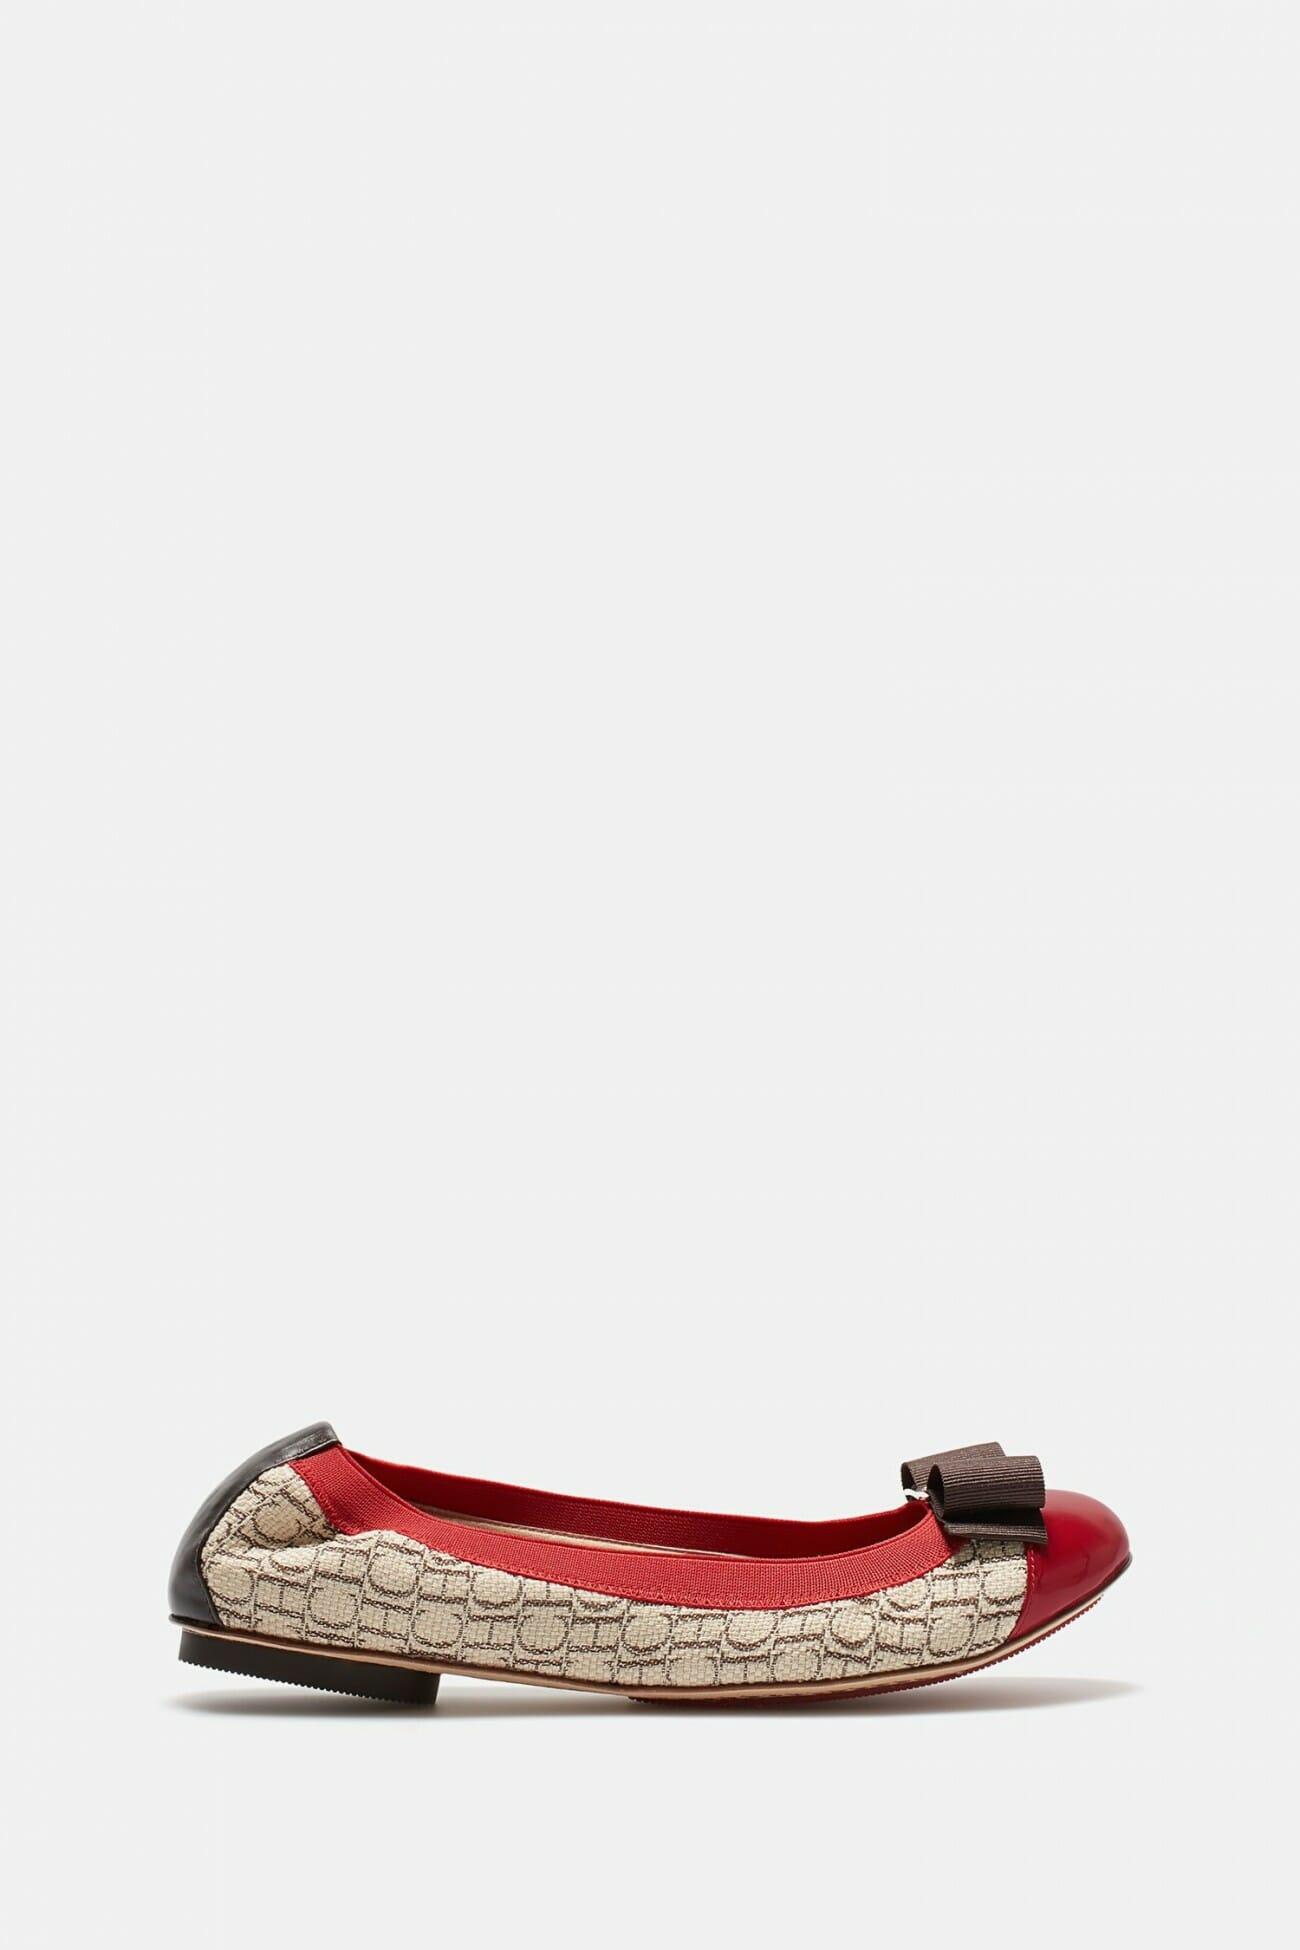 Schuhe 61 | Carolina Herrera